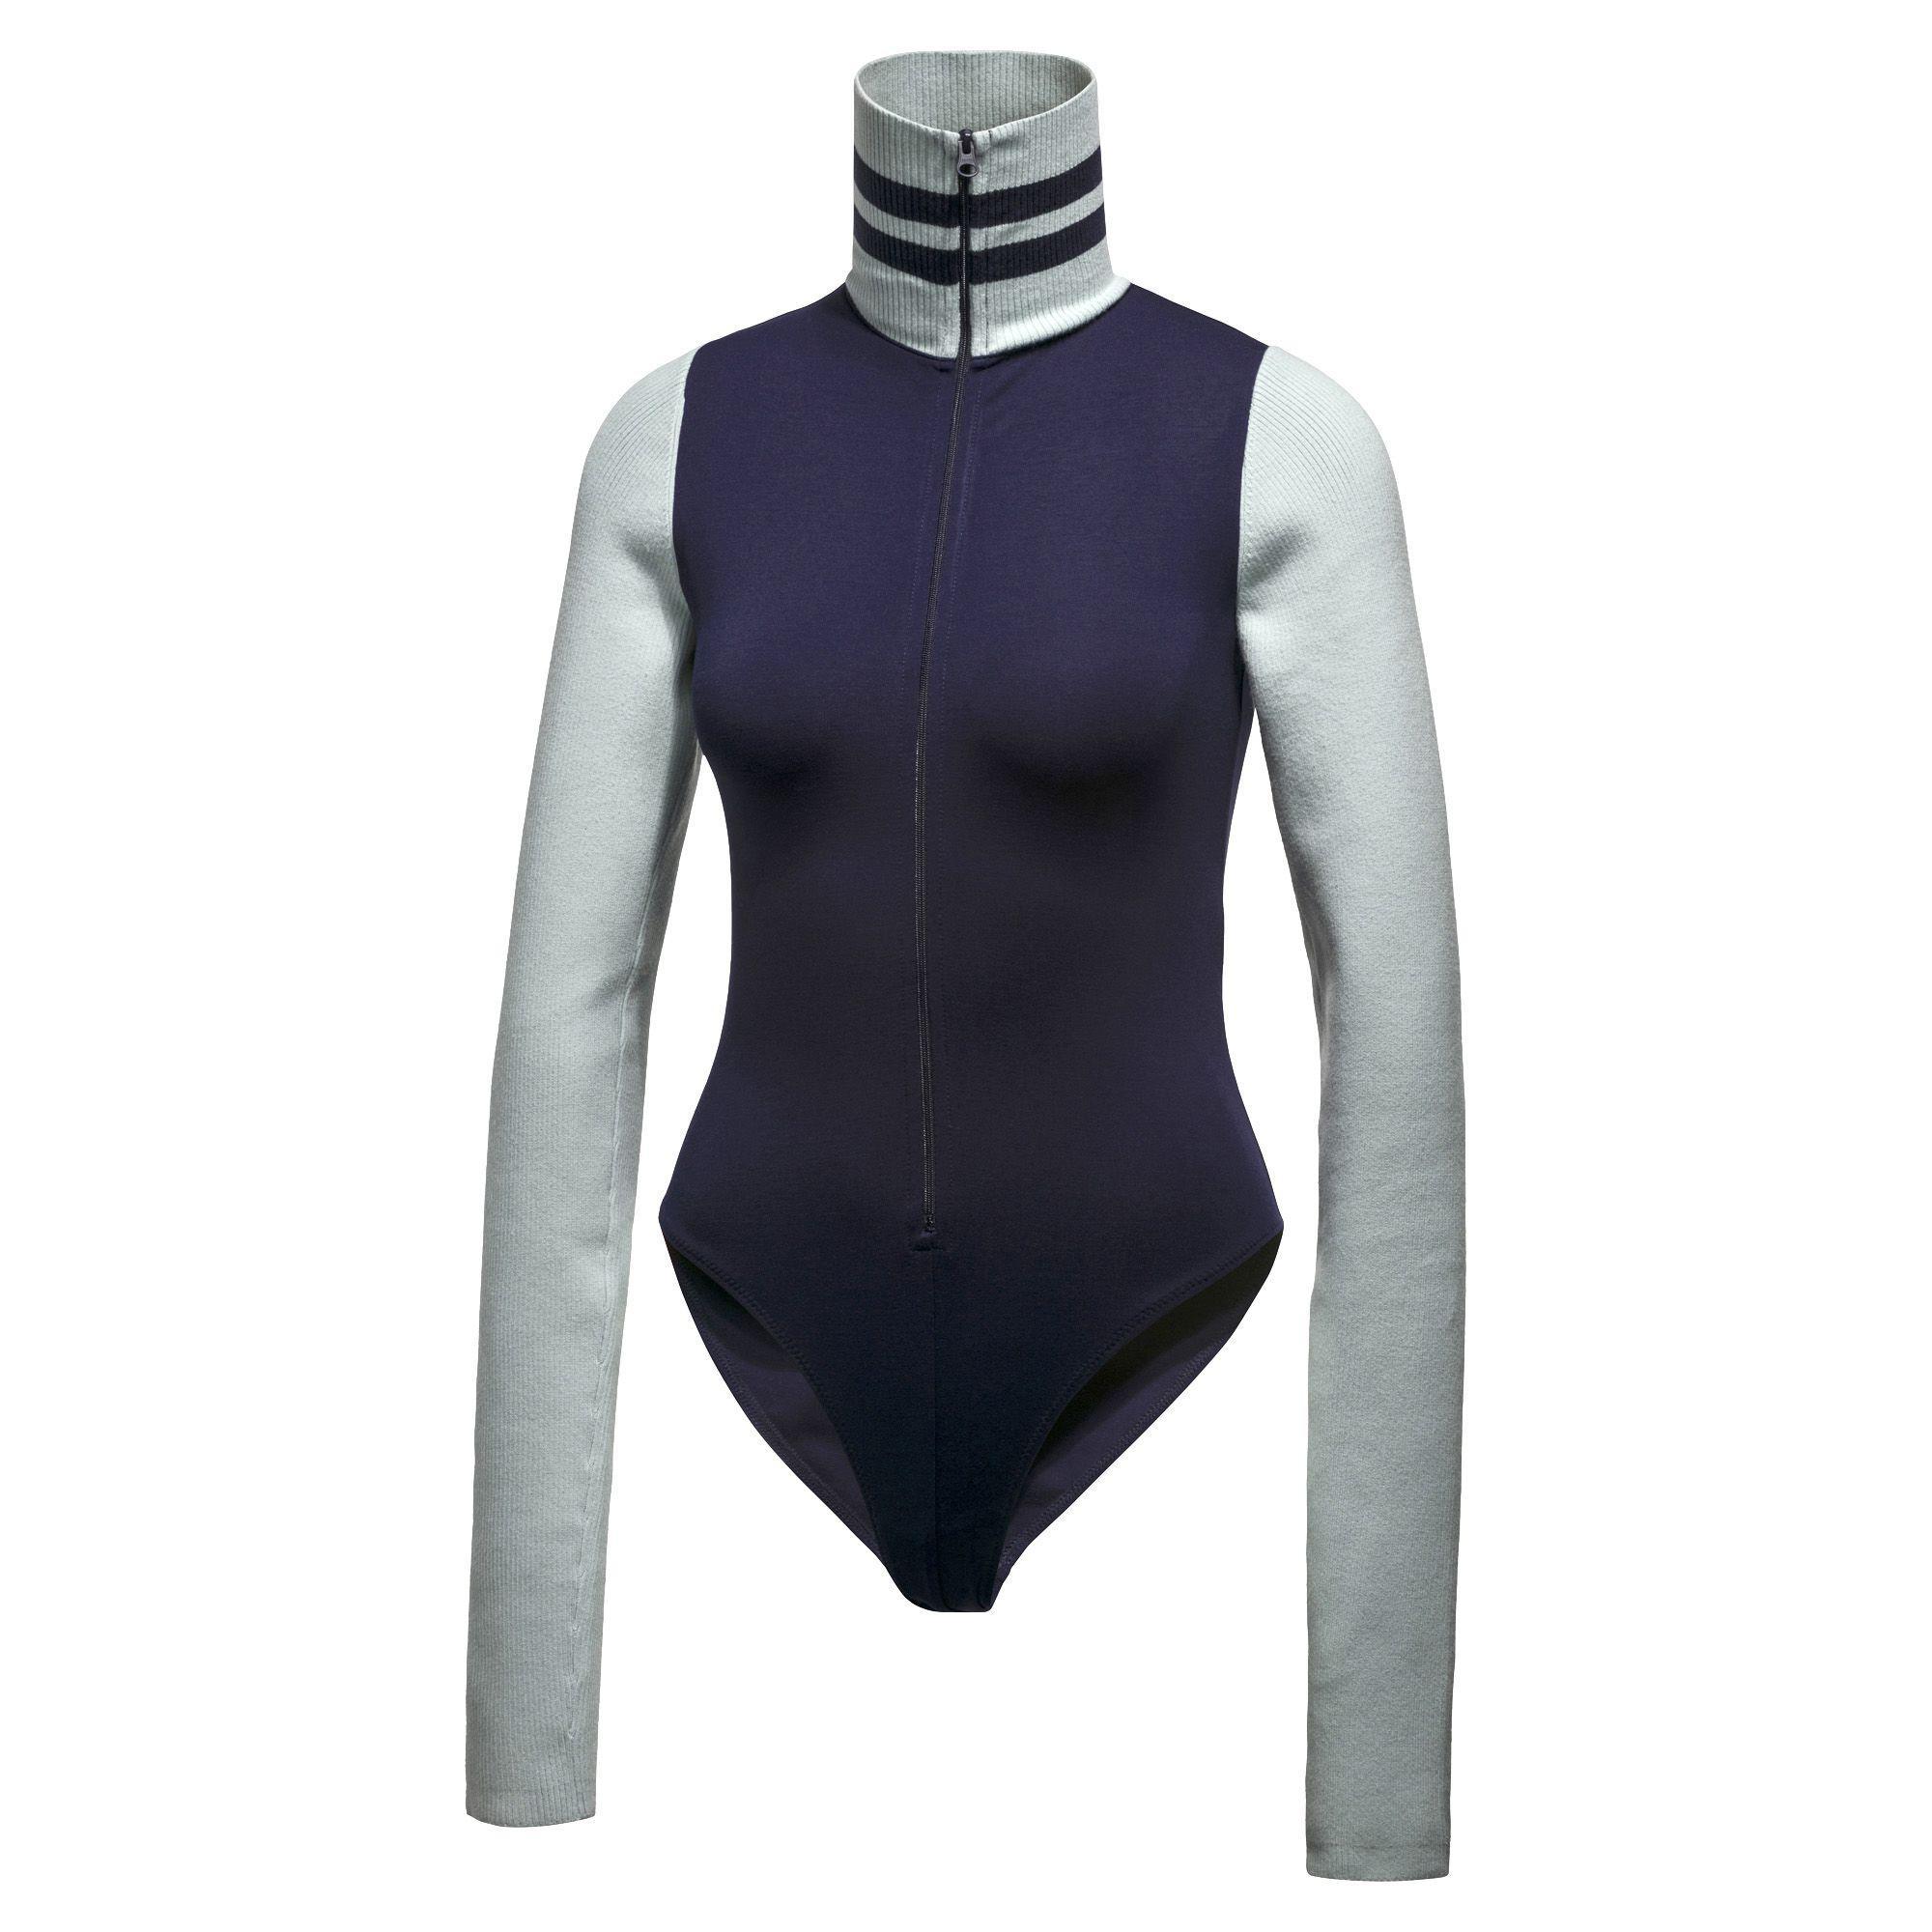 e1377162c7 PUMA Blue Fenty Women's Longsleeve Full Zip Bodysuit